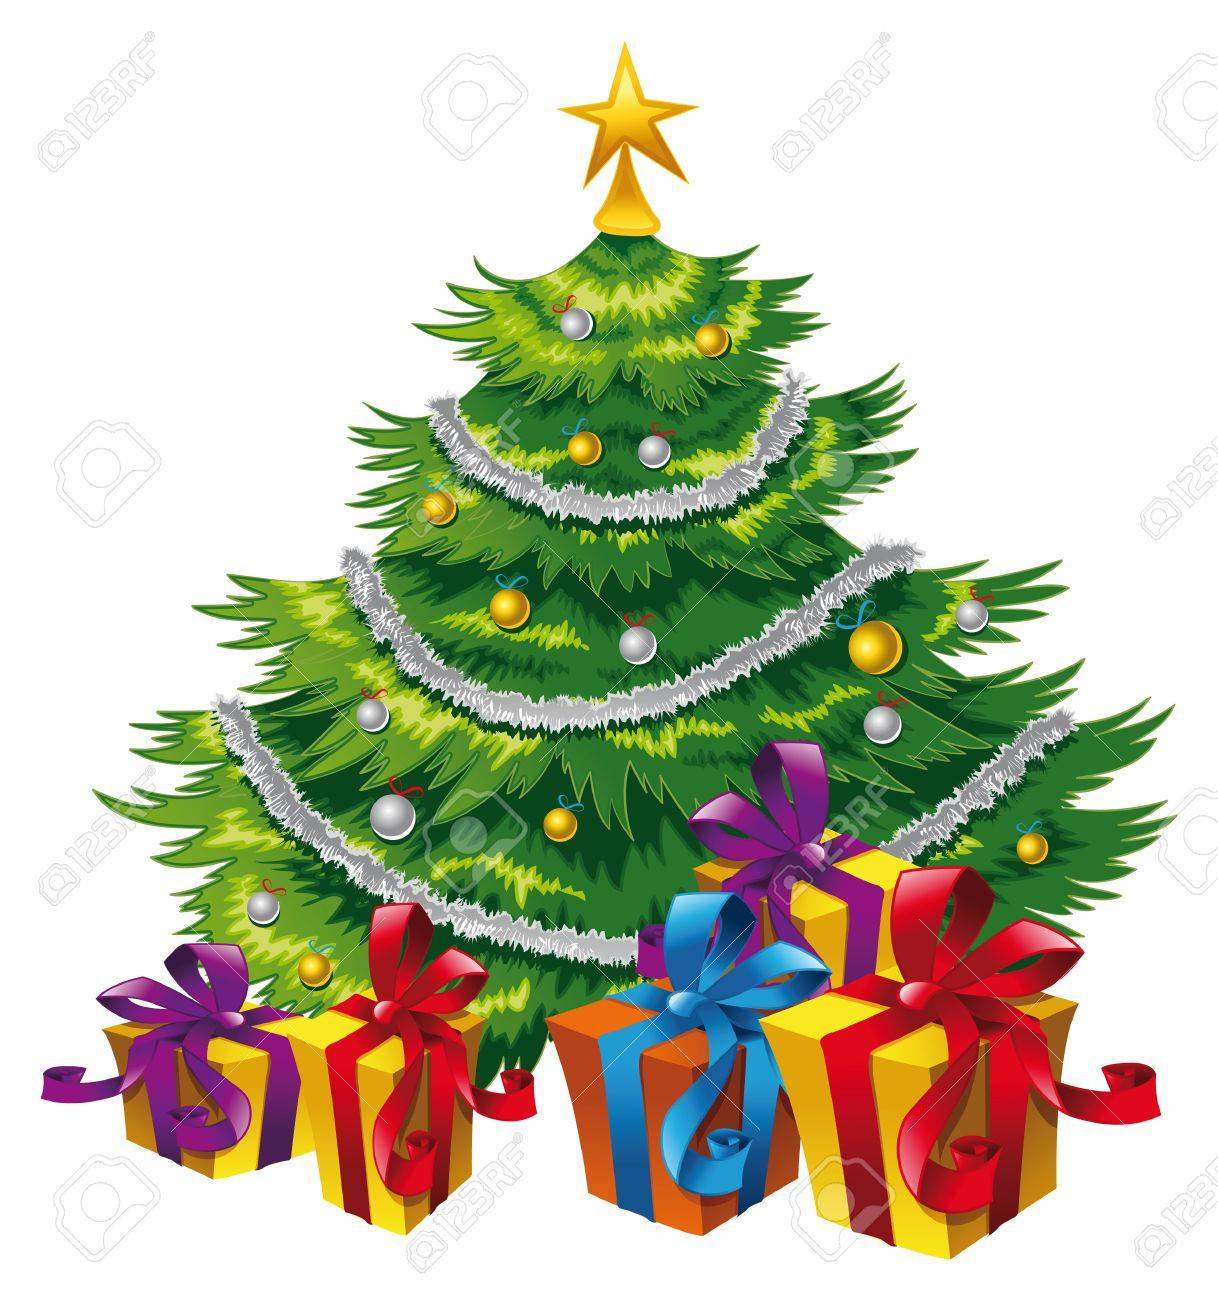 christmas tree, cartoon and vector scene royalty free cliparts